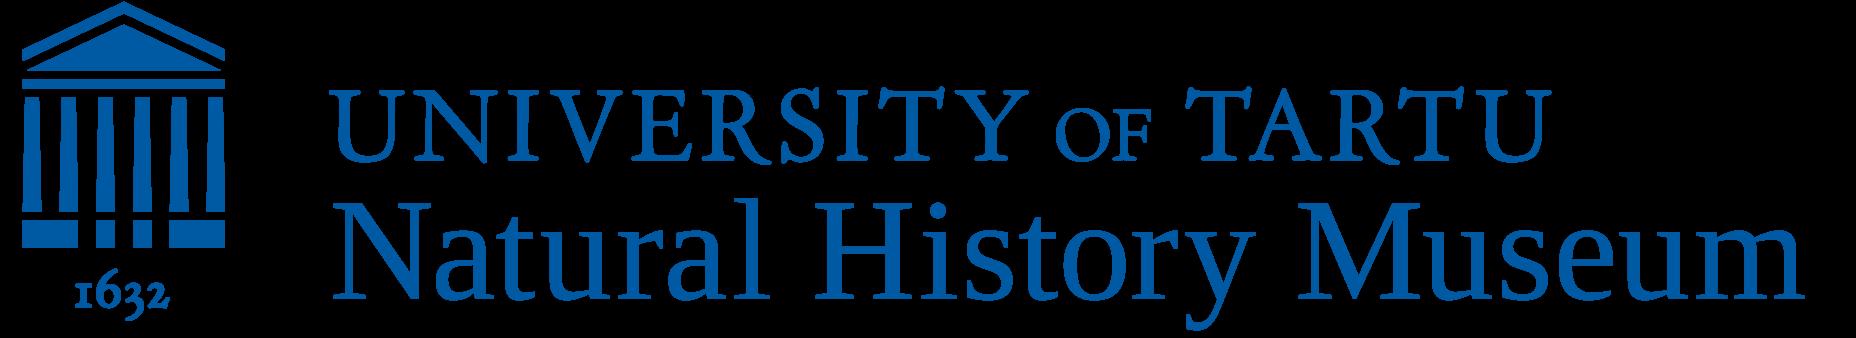 UT NHM logo